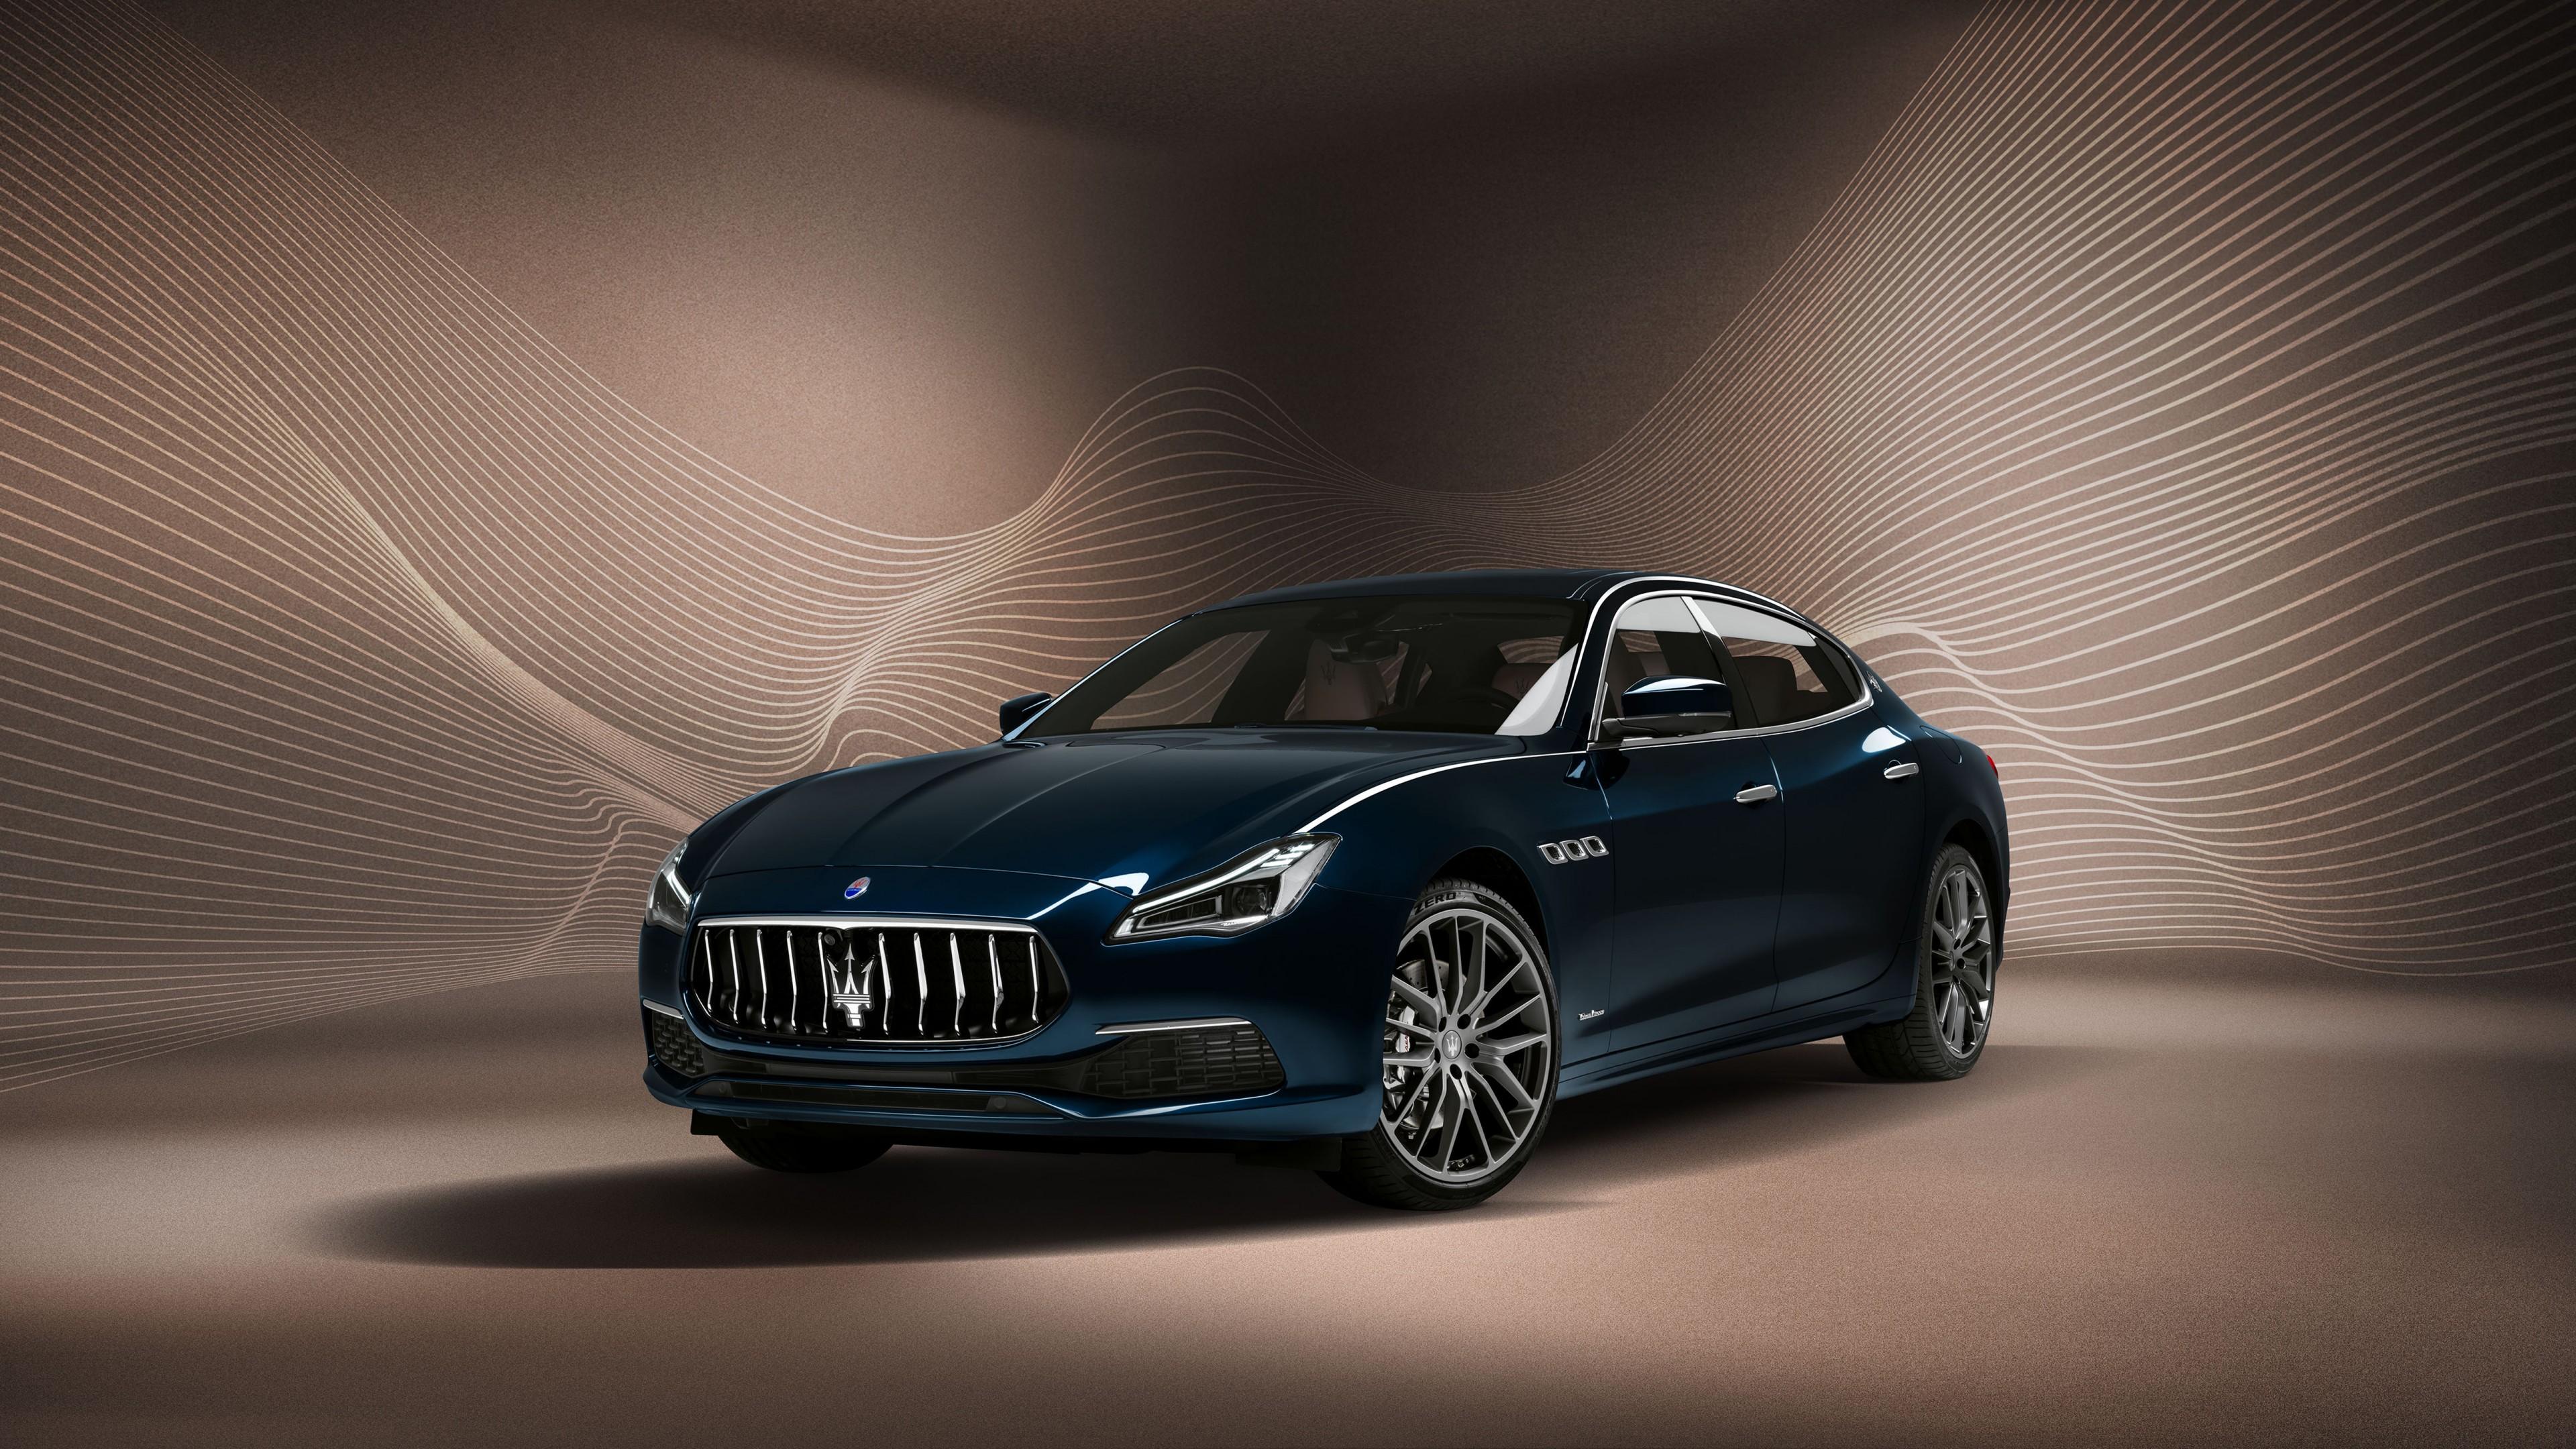 Maserati Quattroporte GranLusso Royale 2020 5K Wallpaper HD Car 3840x2160